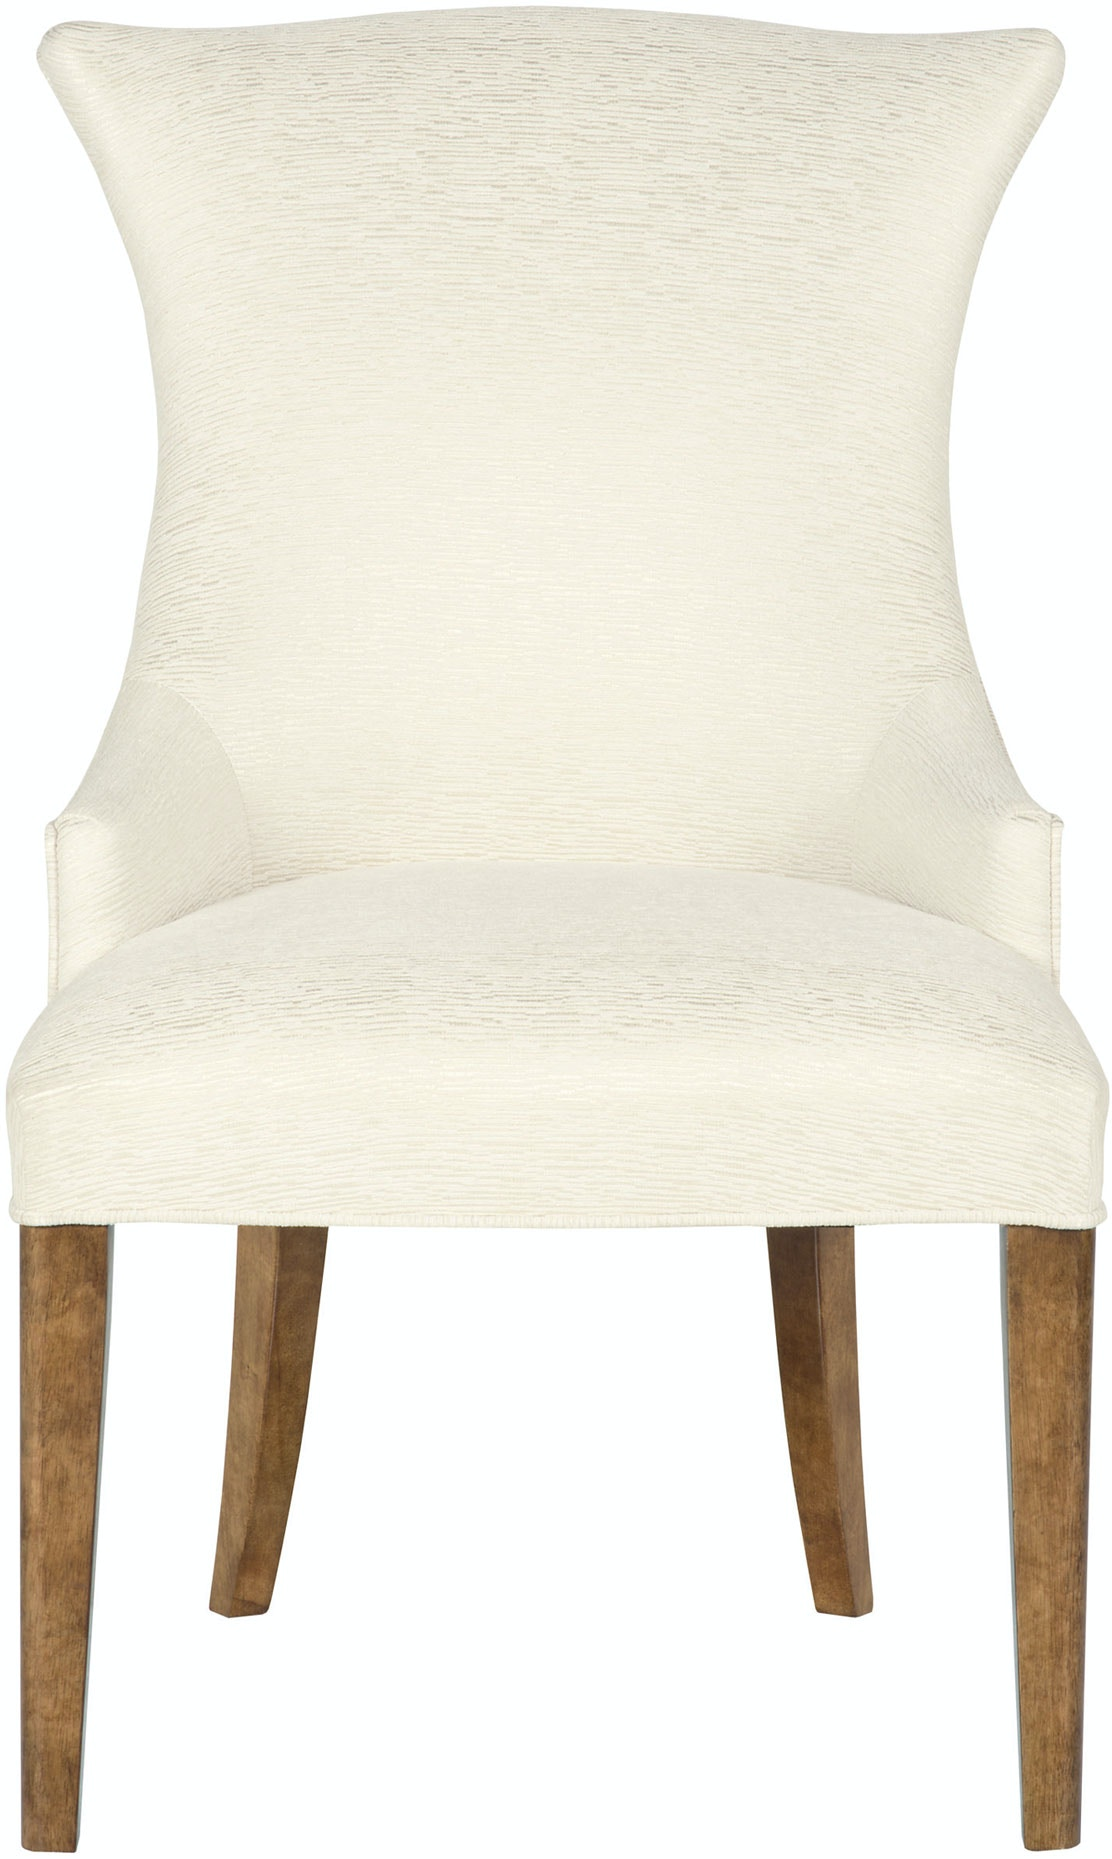 Bernhardt Furniture Soho Luxe Goods Home Furnishings